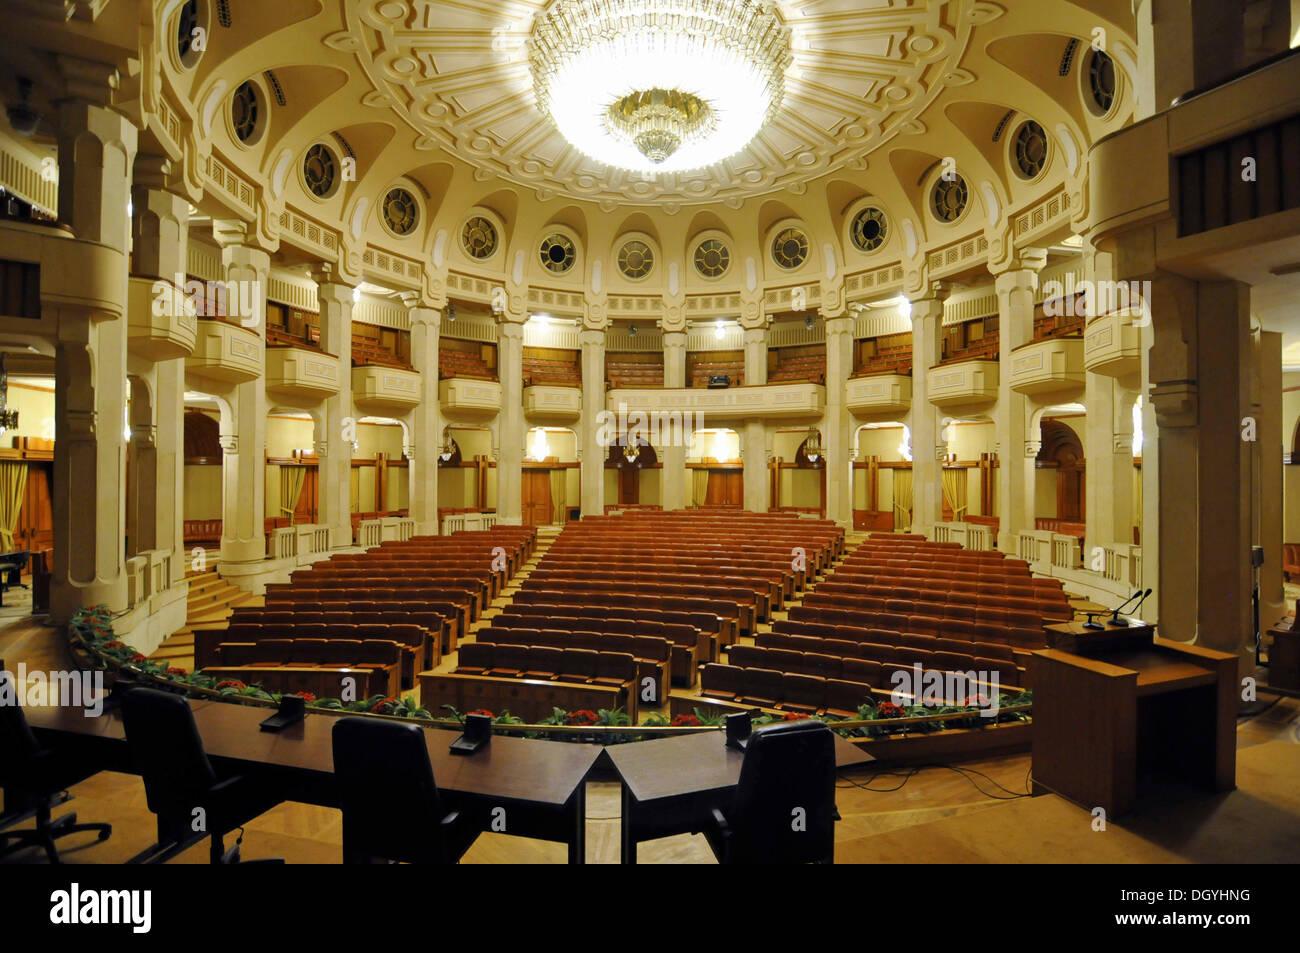 https://c8.alamy.com/compde/dgyhng/theater-interieur-palast-des-parlaments-bukarest-rumanien-europa-dgyhng.jpg